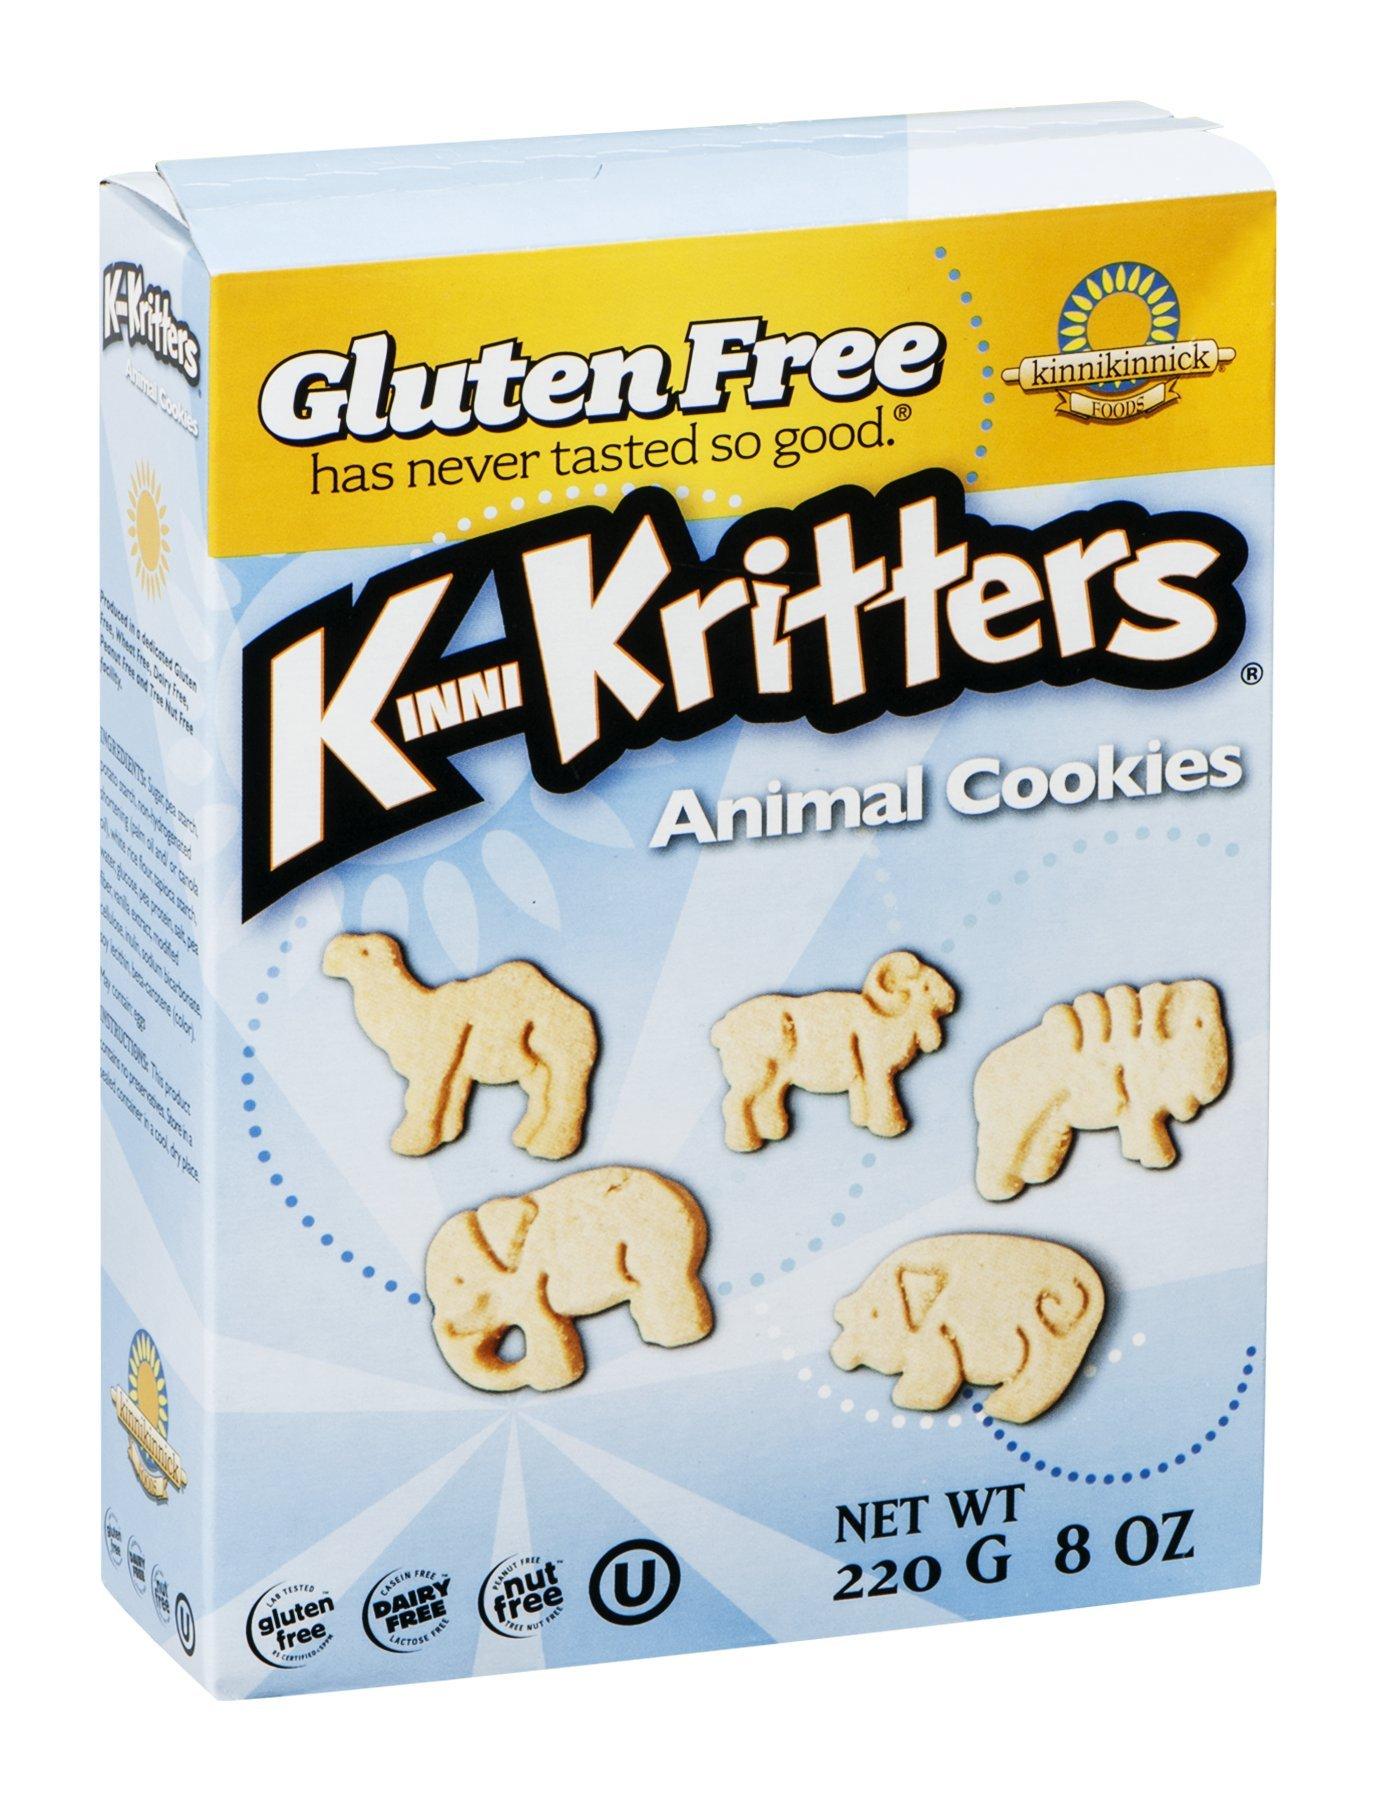 Kinnikinnick Foods KinniKritters Animal Cookies, Gluten Free, Wheat Free, Dairy Free, 8-Ounce Box (Pack of 6) ( Value Bulk Multi-pack)